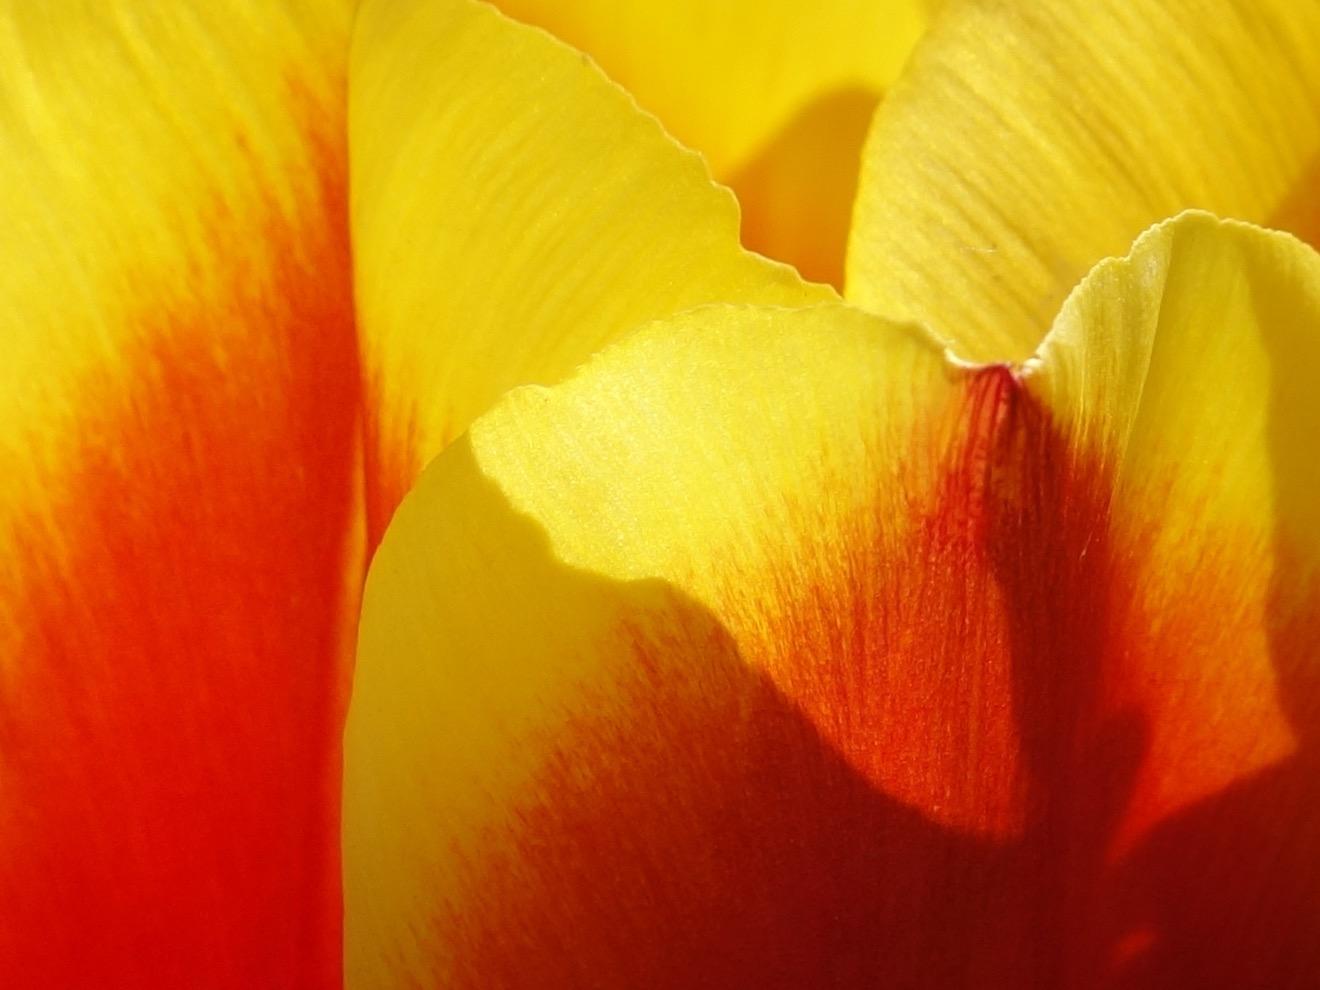 tulip 5 © KIM JONKER